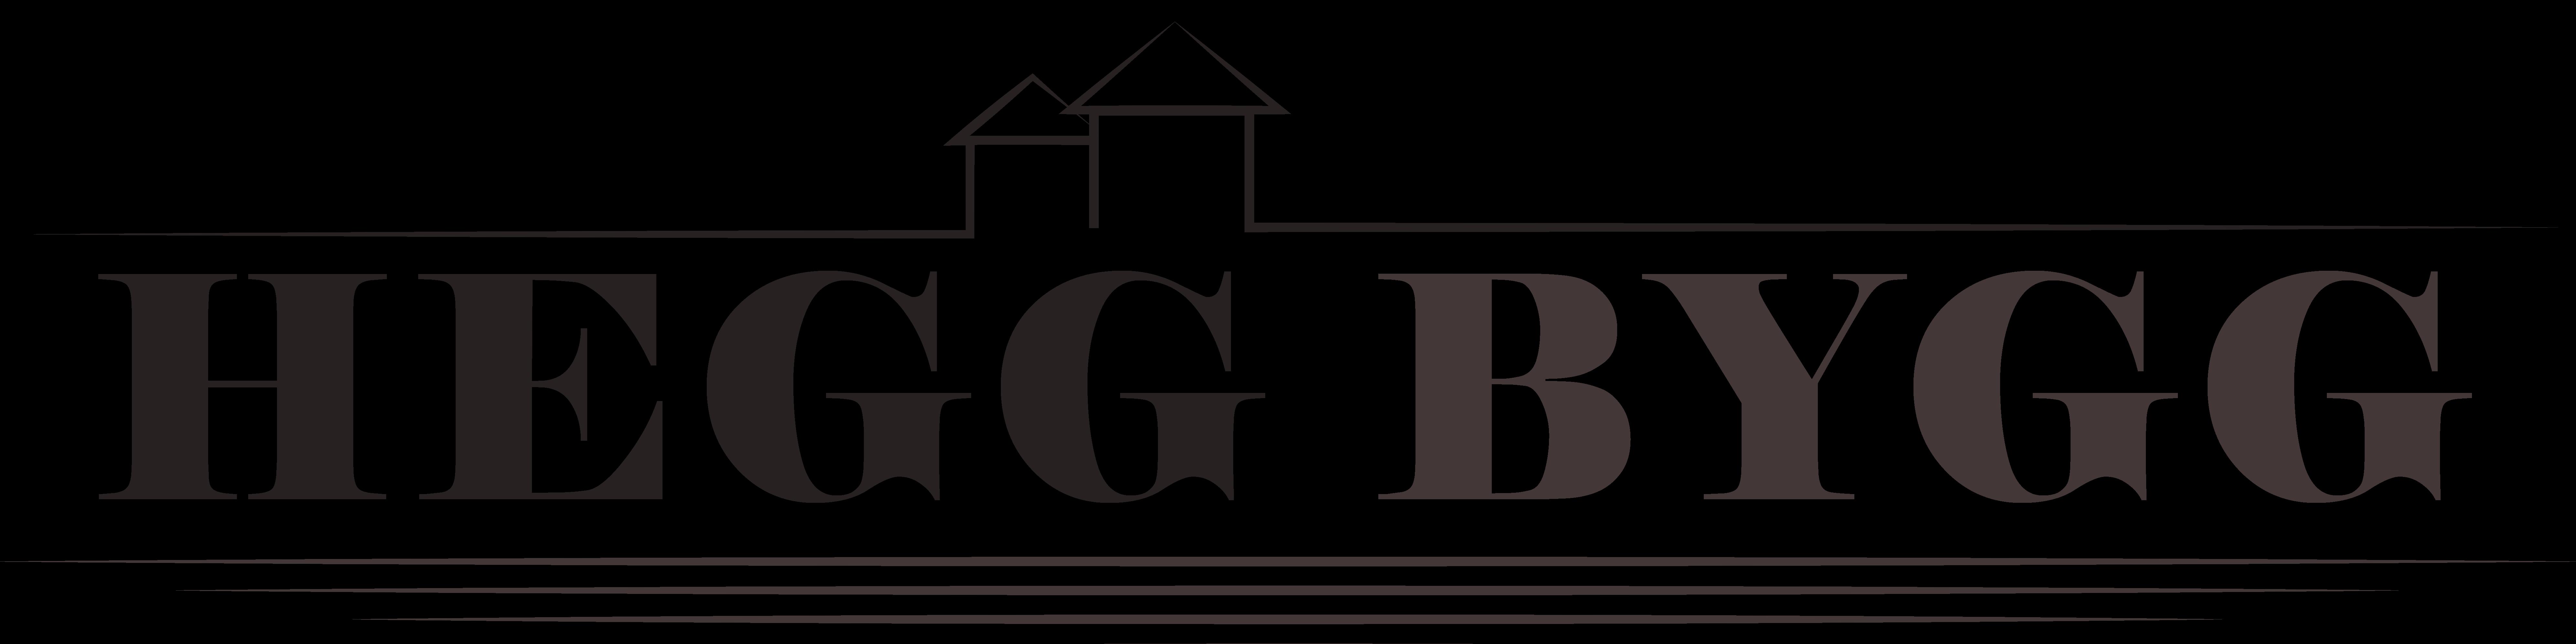 Transparent Hegg Bygg Logo